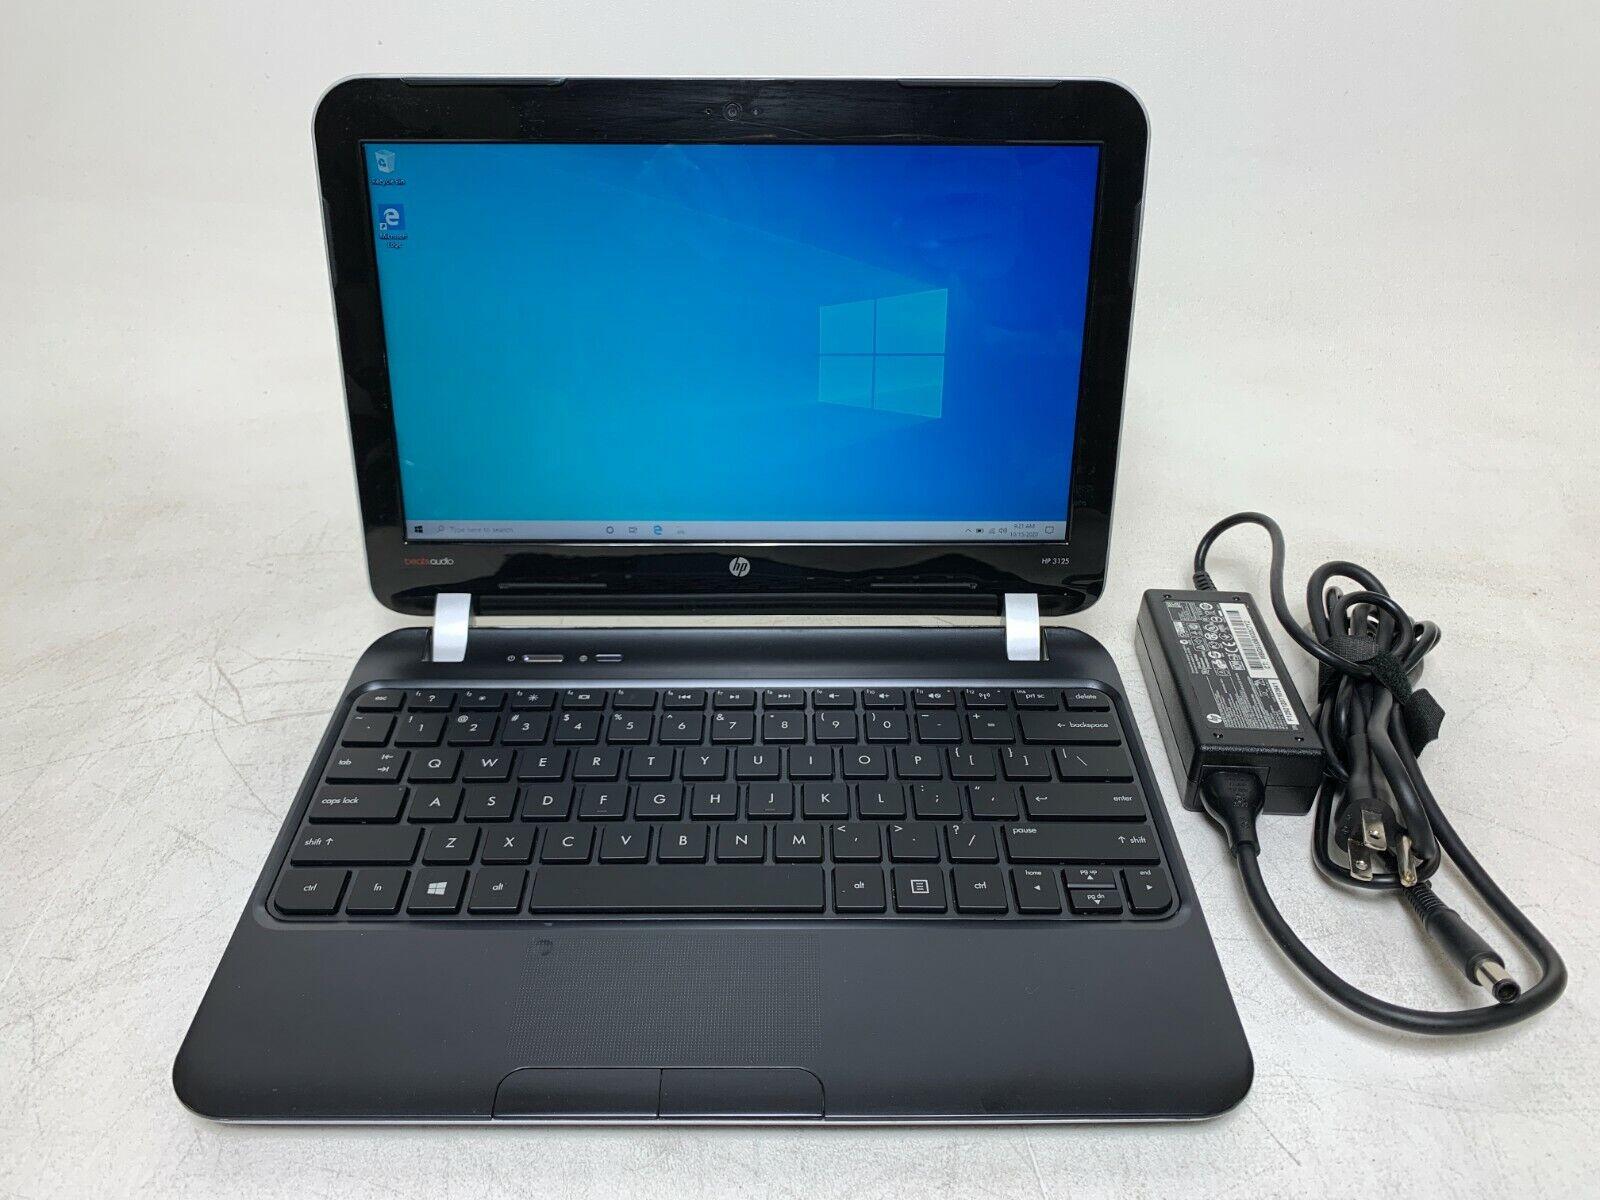 "Laptop Windows - HP 3125m 11.6"" Laptop | AMD E-1500 1.48GHz | 4GB RAM | 320GB HDD | Windows 10"